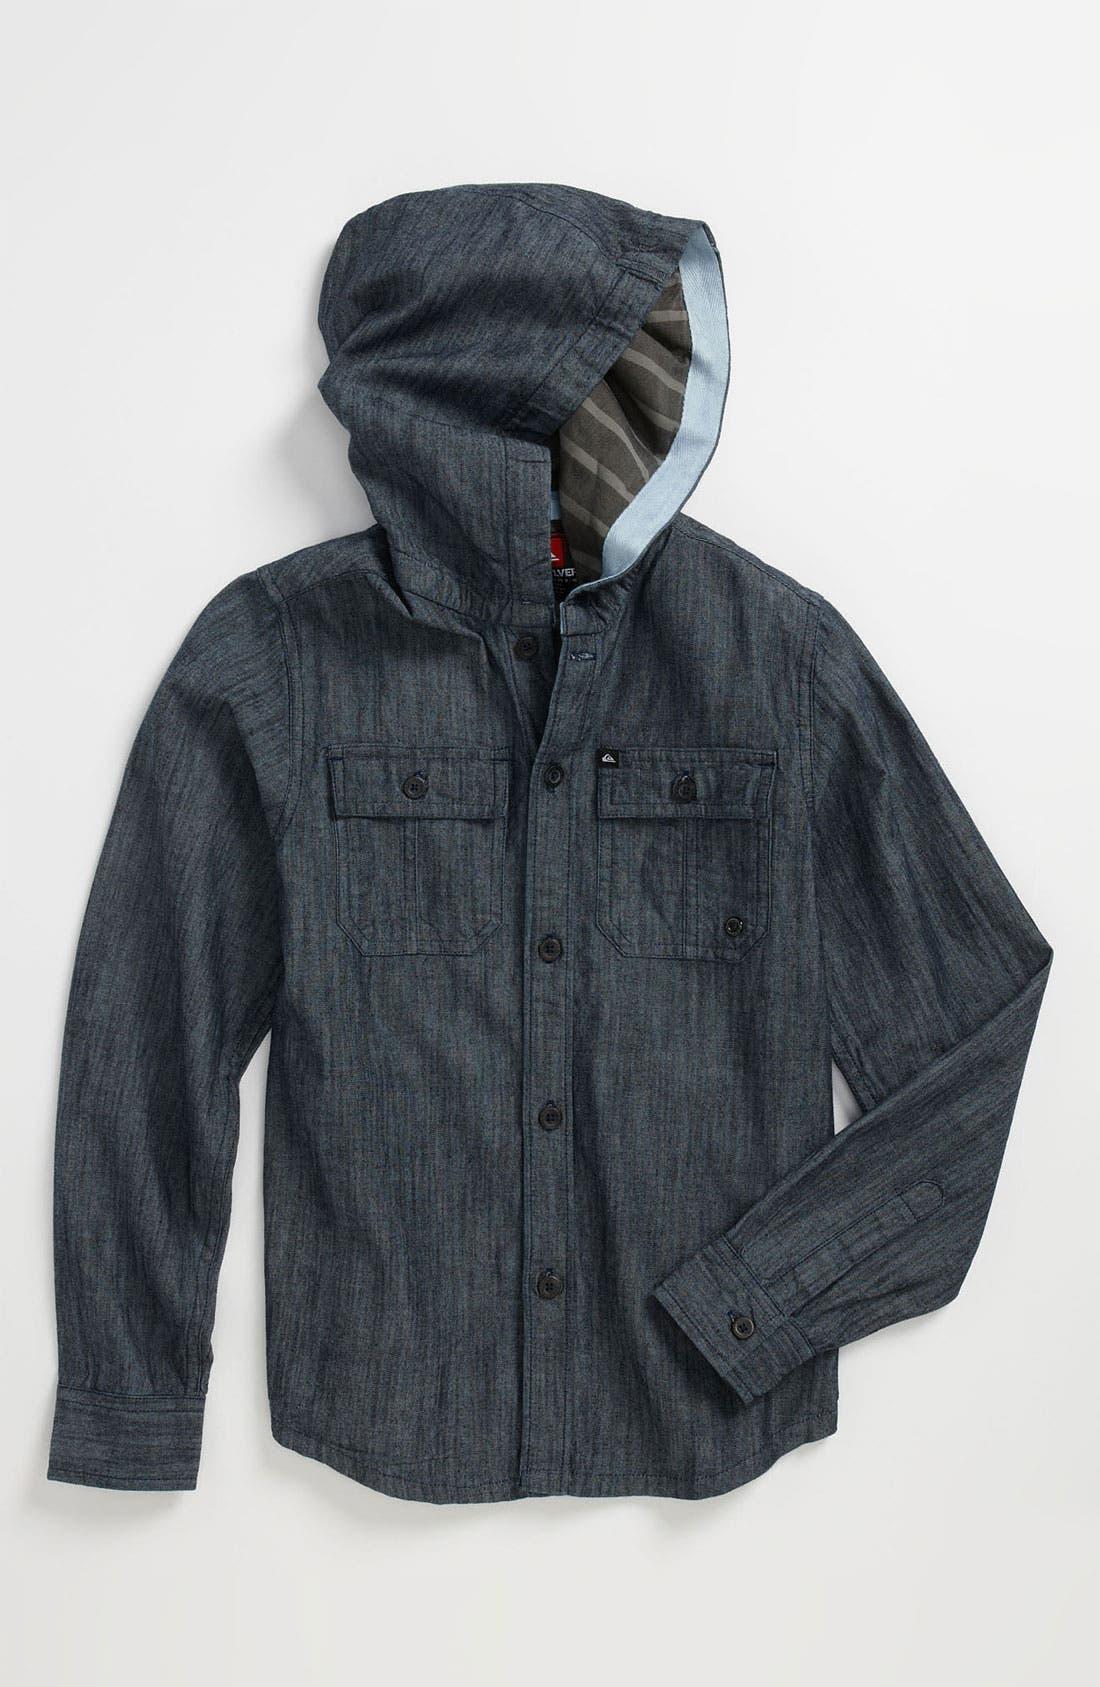 Alternate Image 1 Selected - Quiksilver 'Morning Stroke' Hooded Shirt (Big Boys)